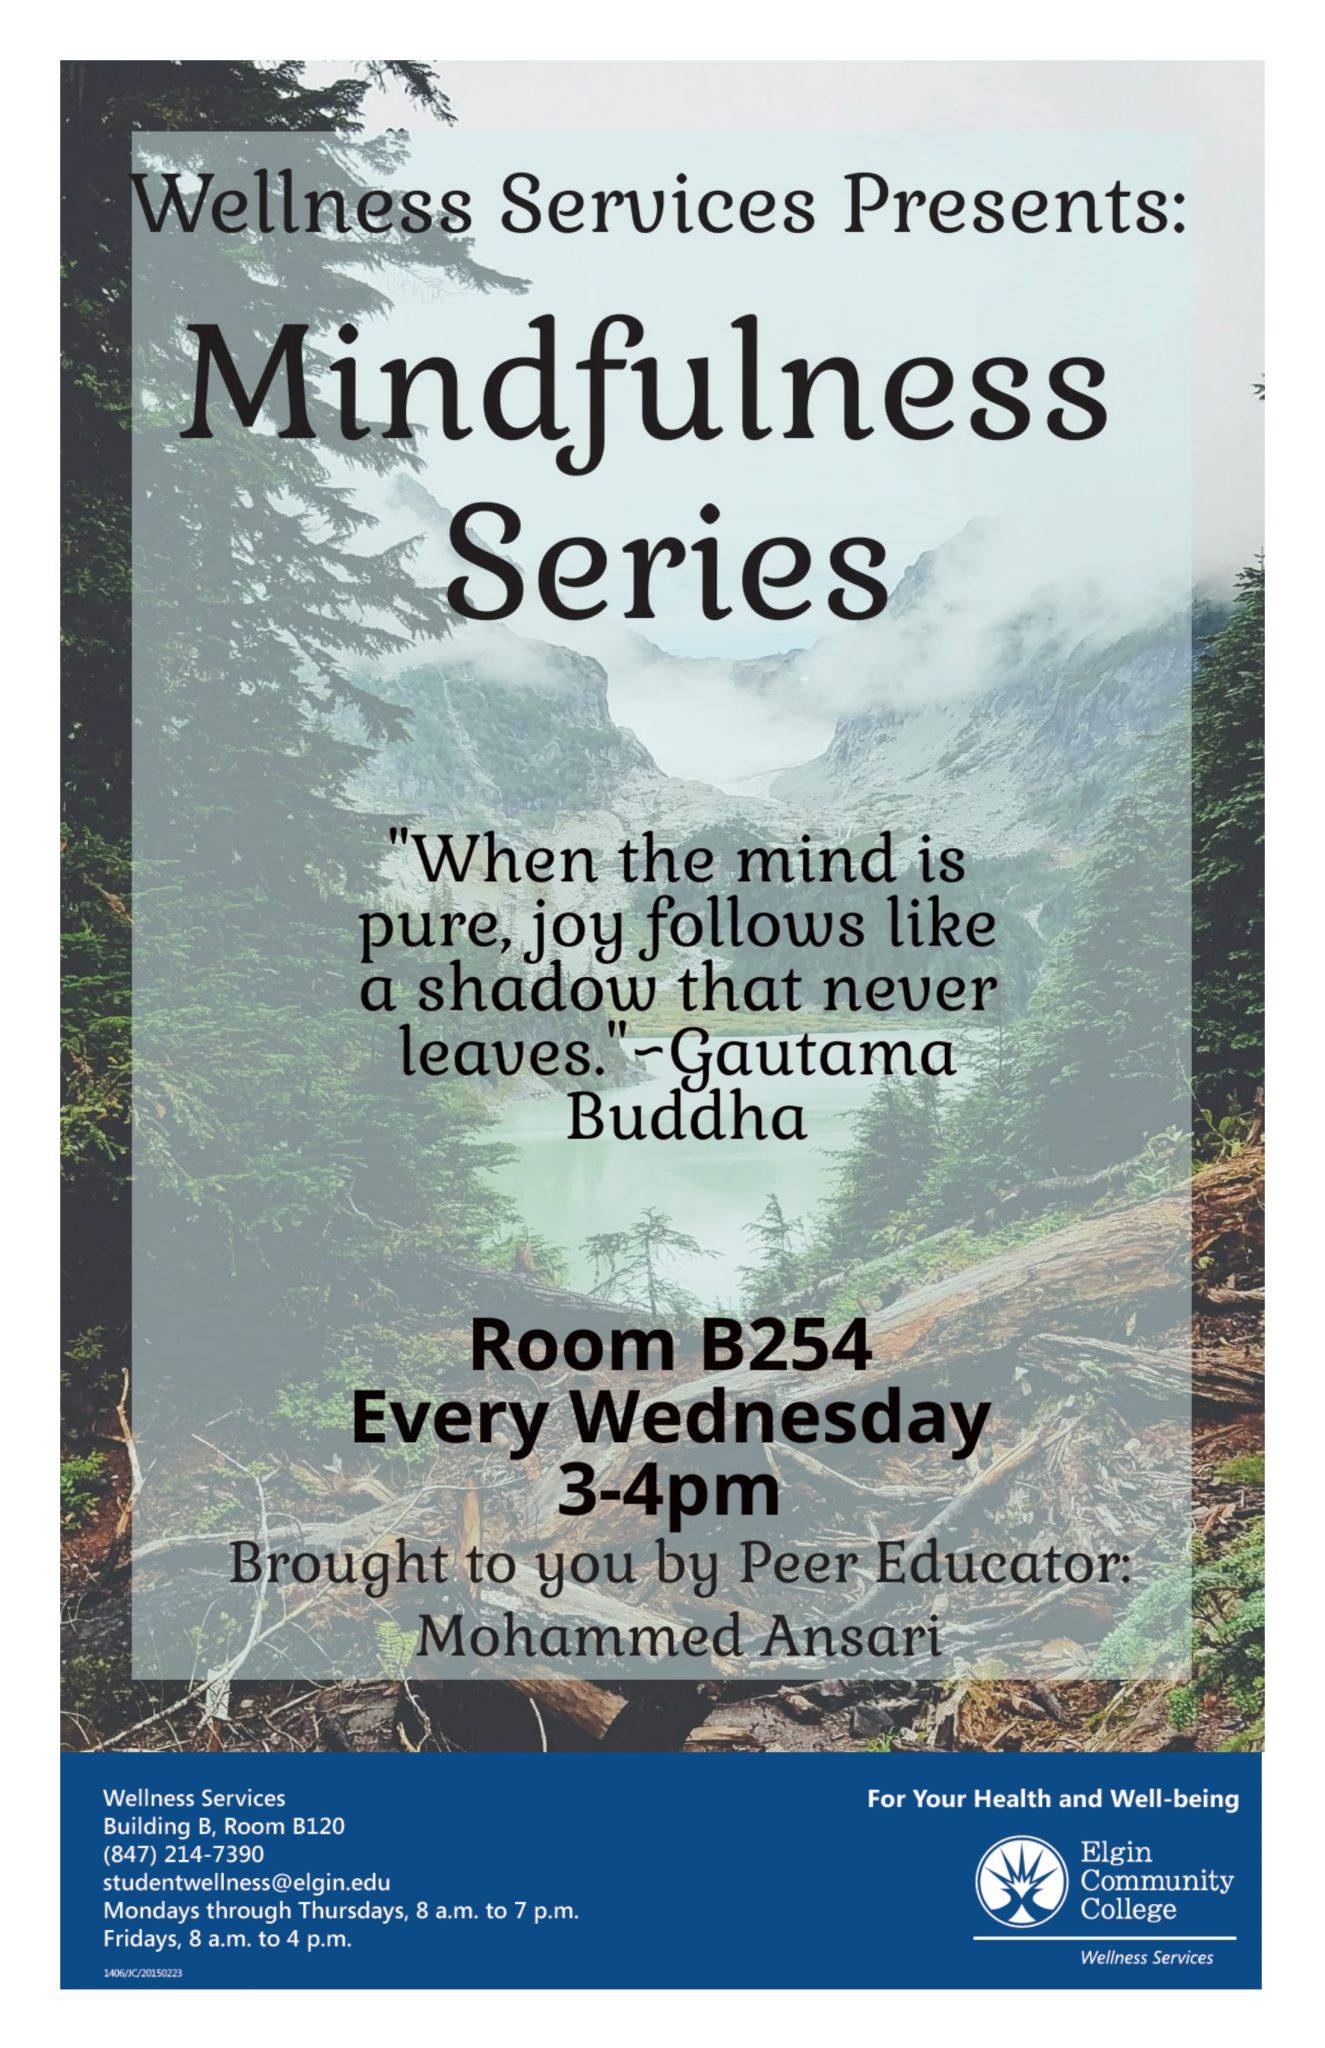 FREE Mindfulness Sessions